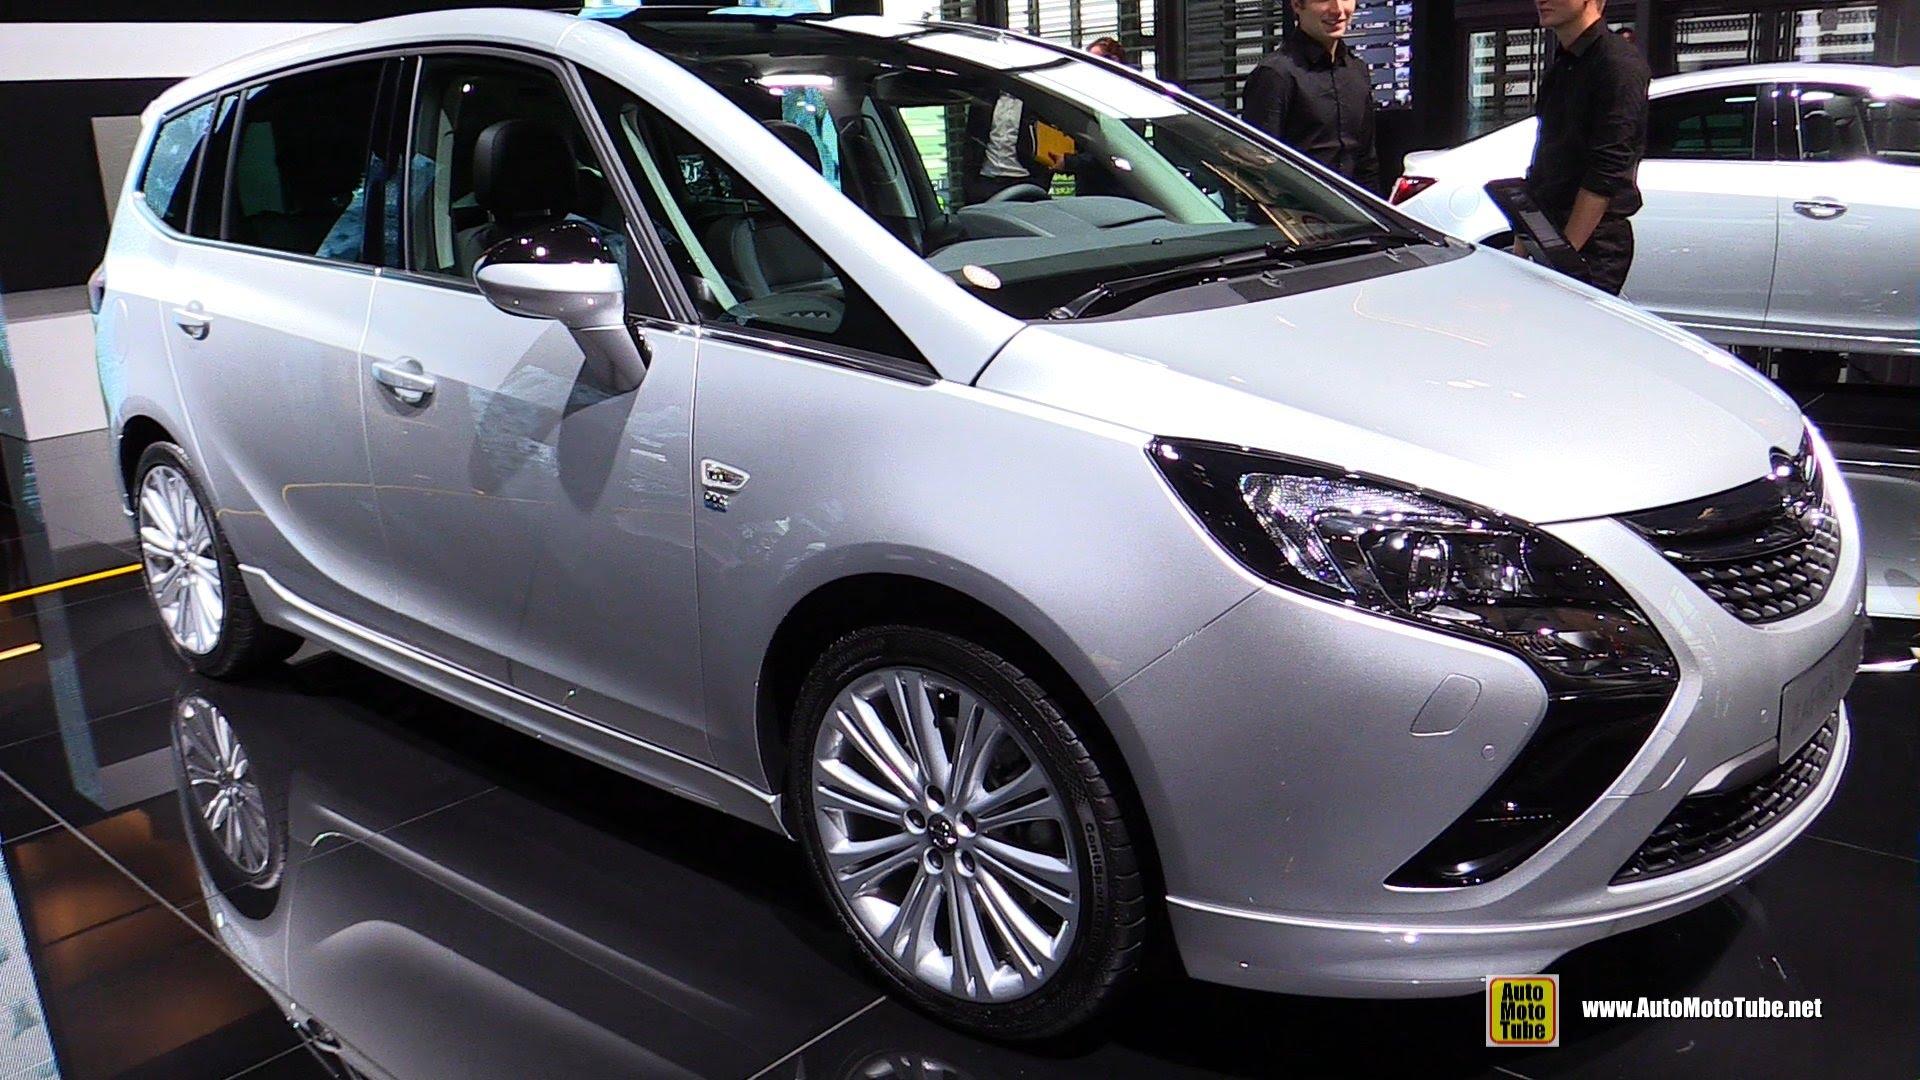 Opel Zafira C Restyling 2016 - now Minivan #3